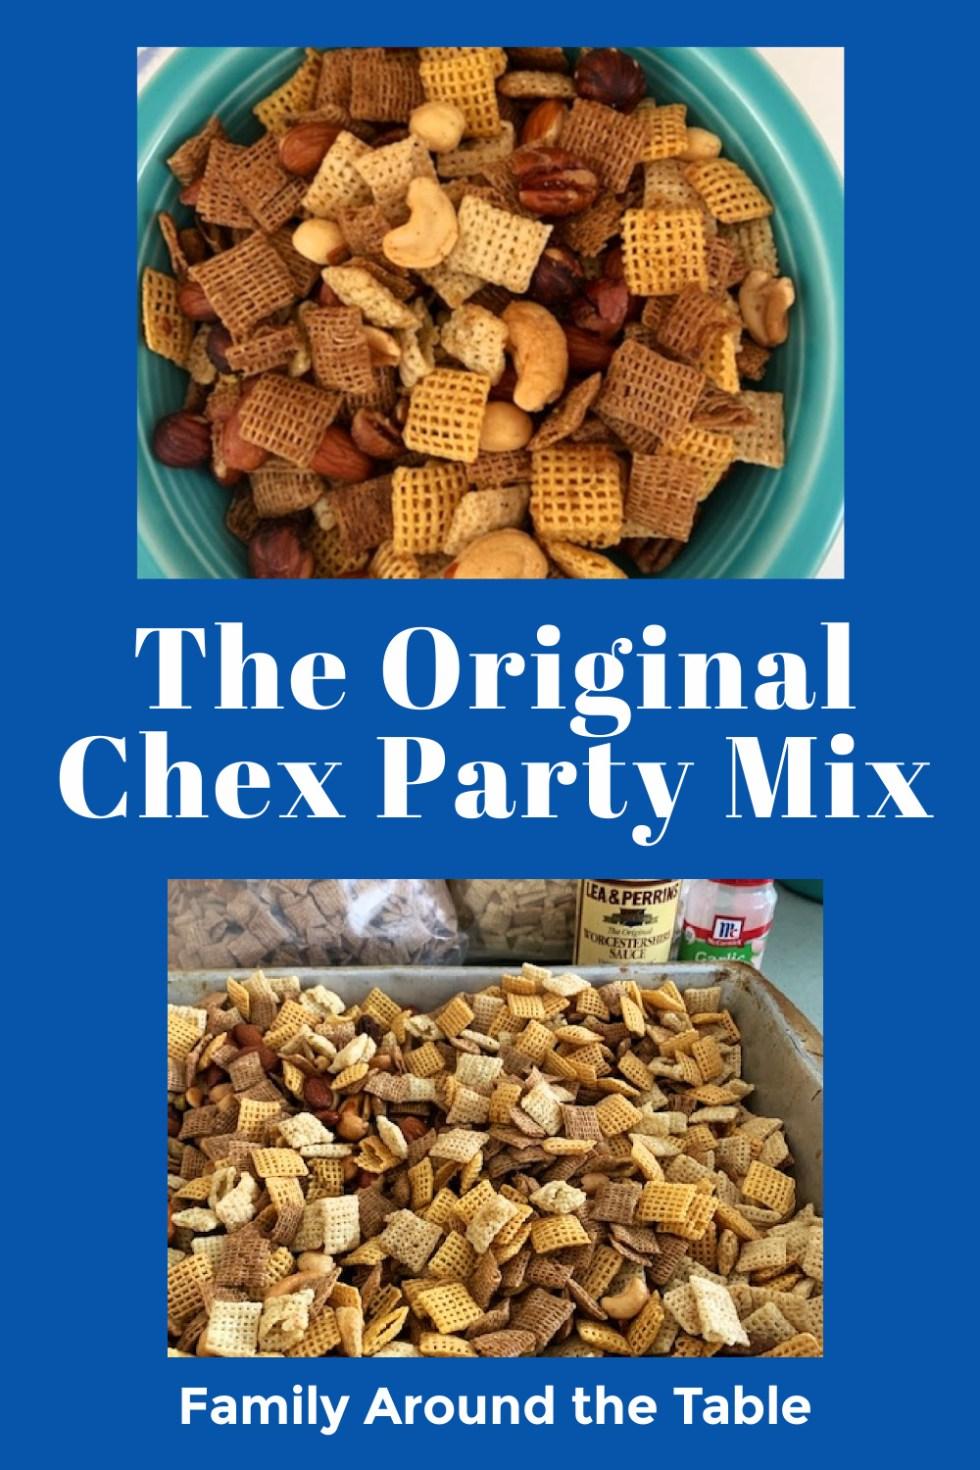 Chex party mix Pinterest image.